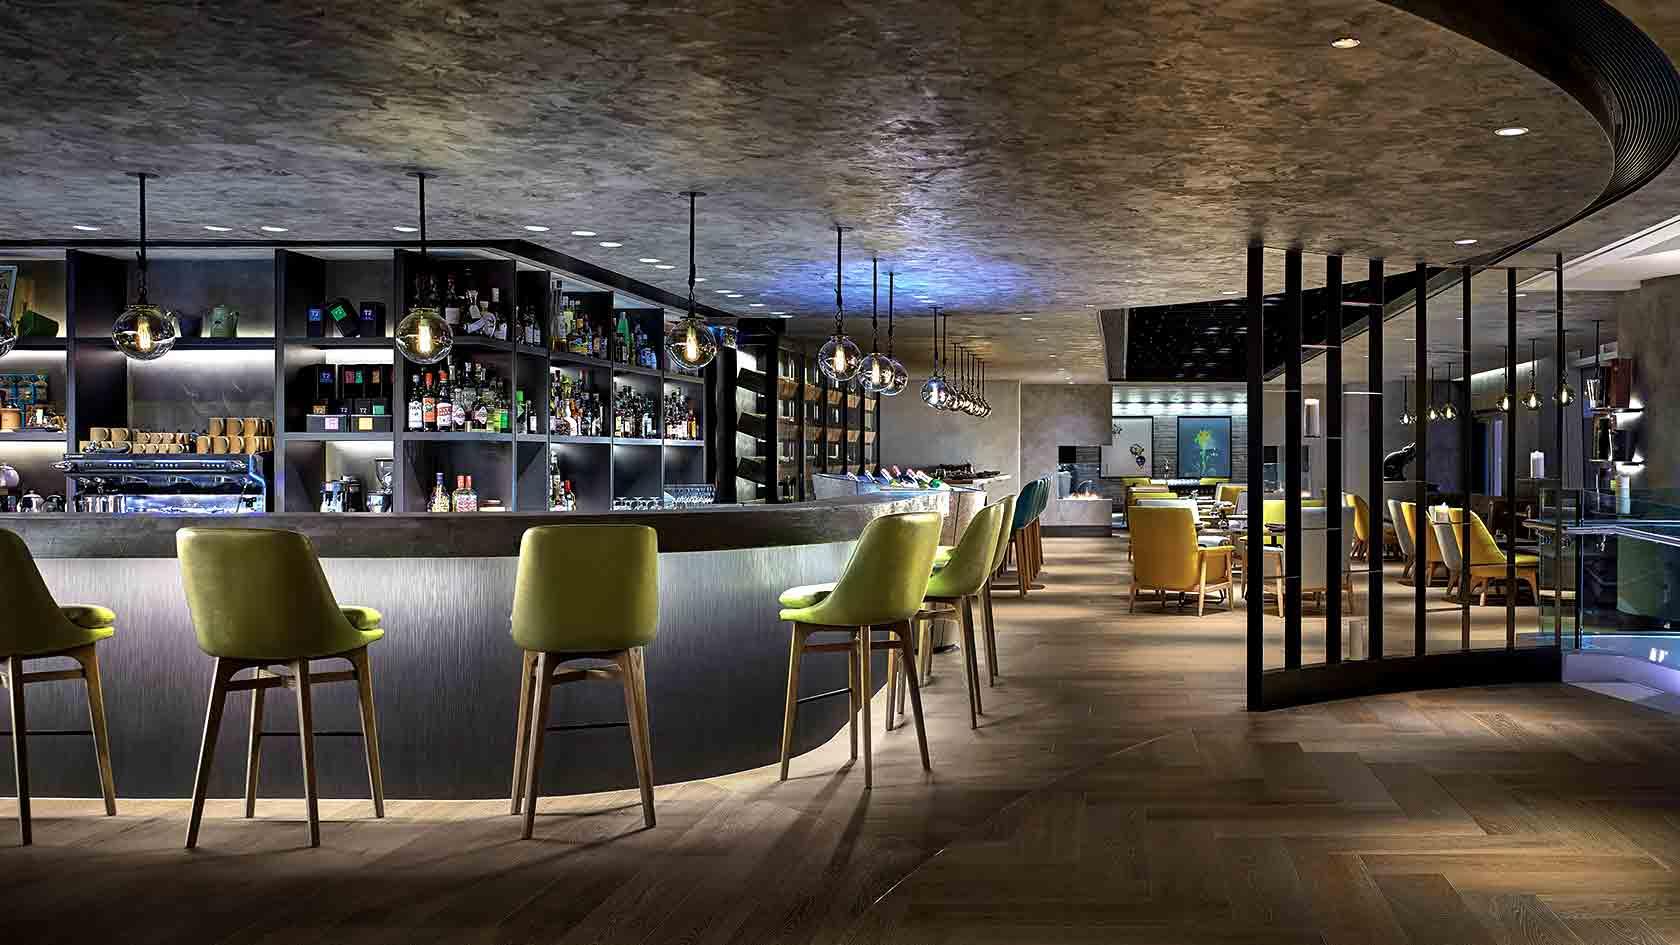 cordis club lounge hong kong bar over all view